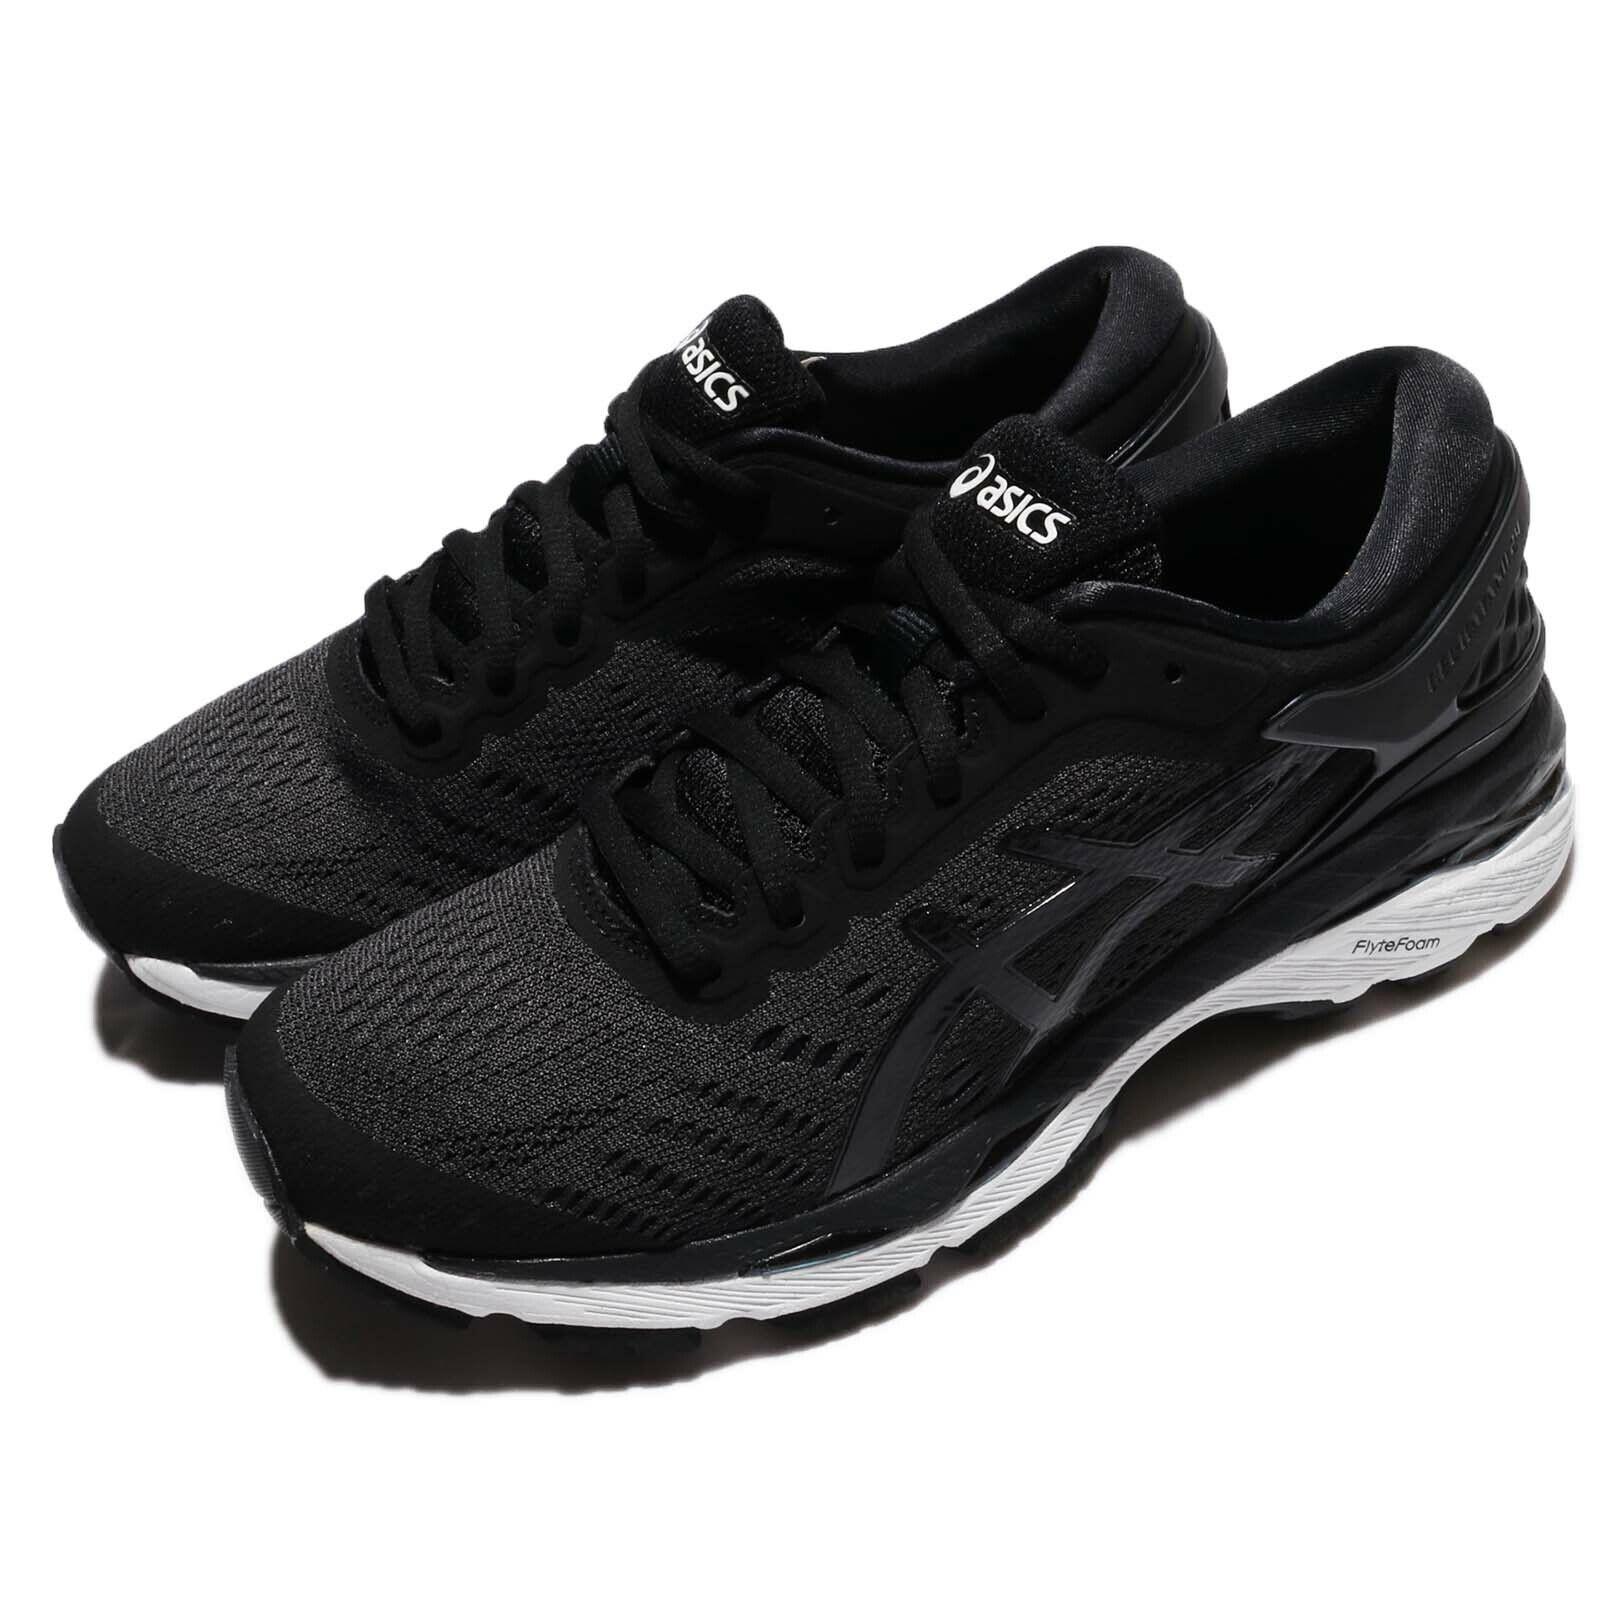 Asics Gel-Kayano 24 nero bianca donna Running Training scarpe scarpe da ginnastica T799N-9016